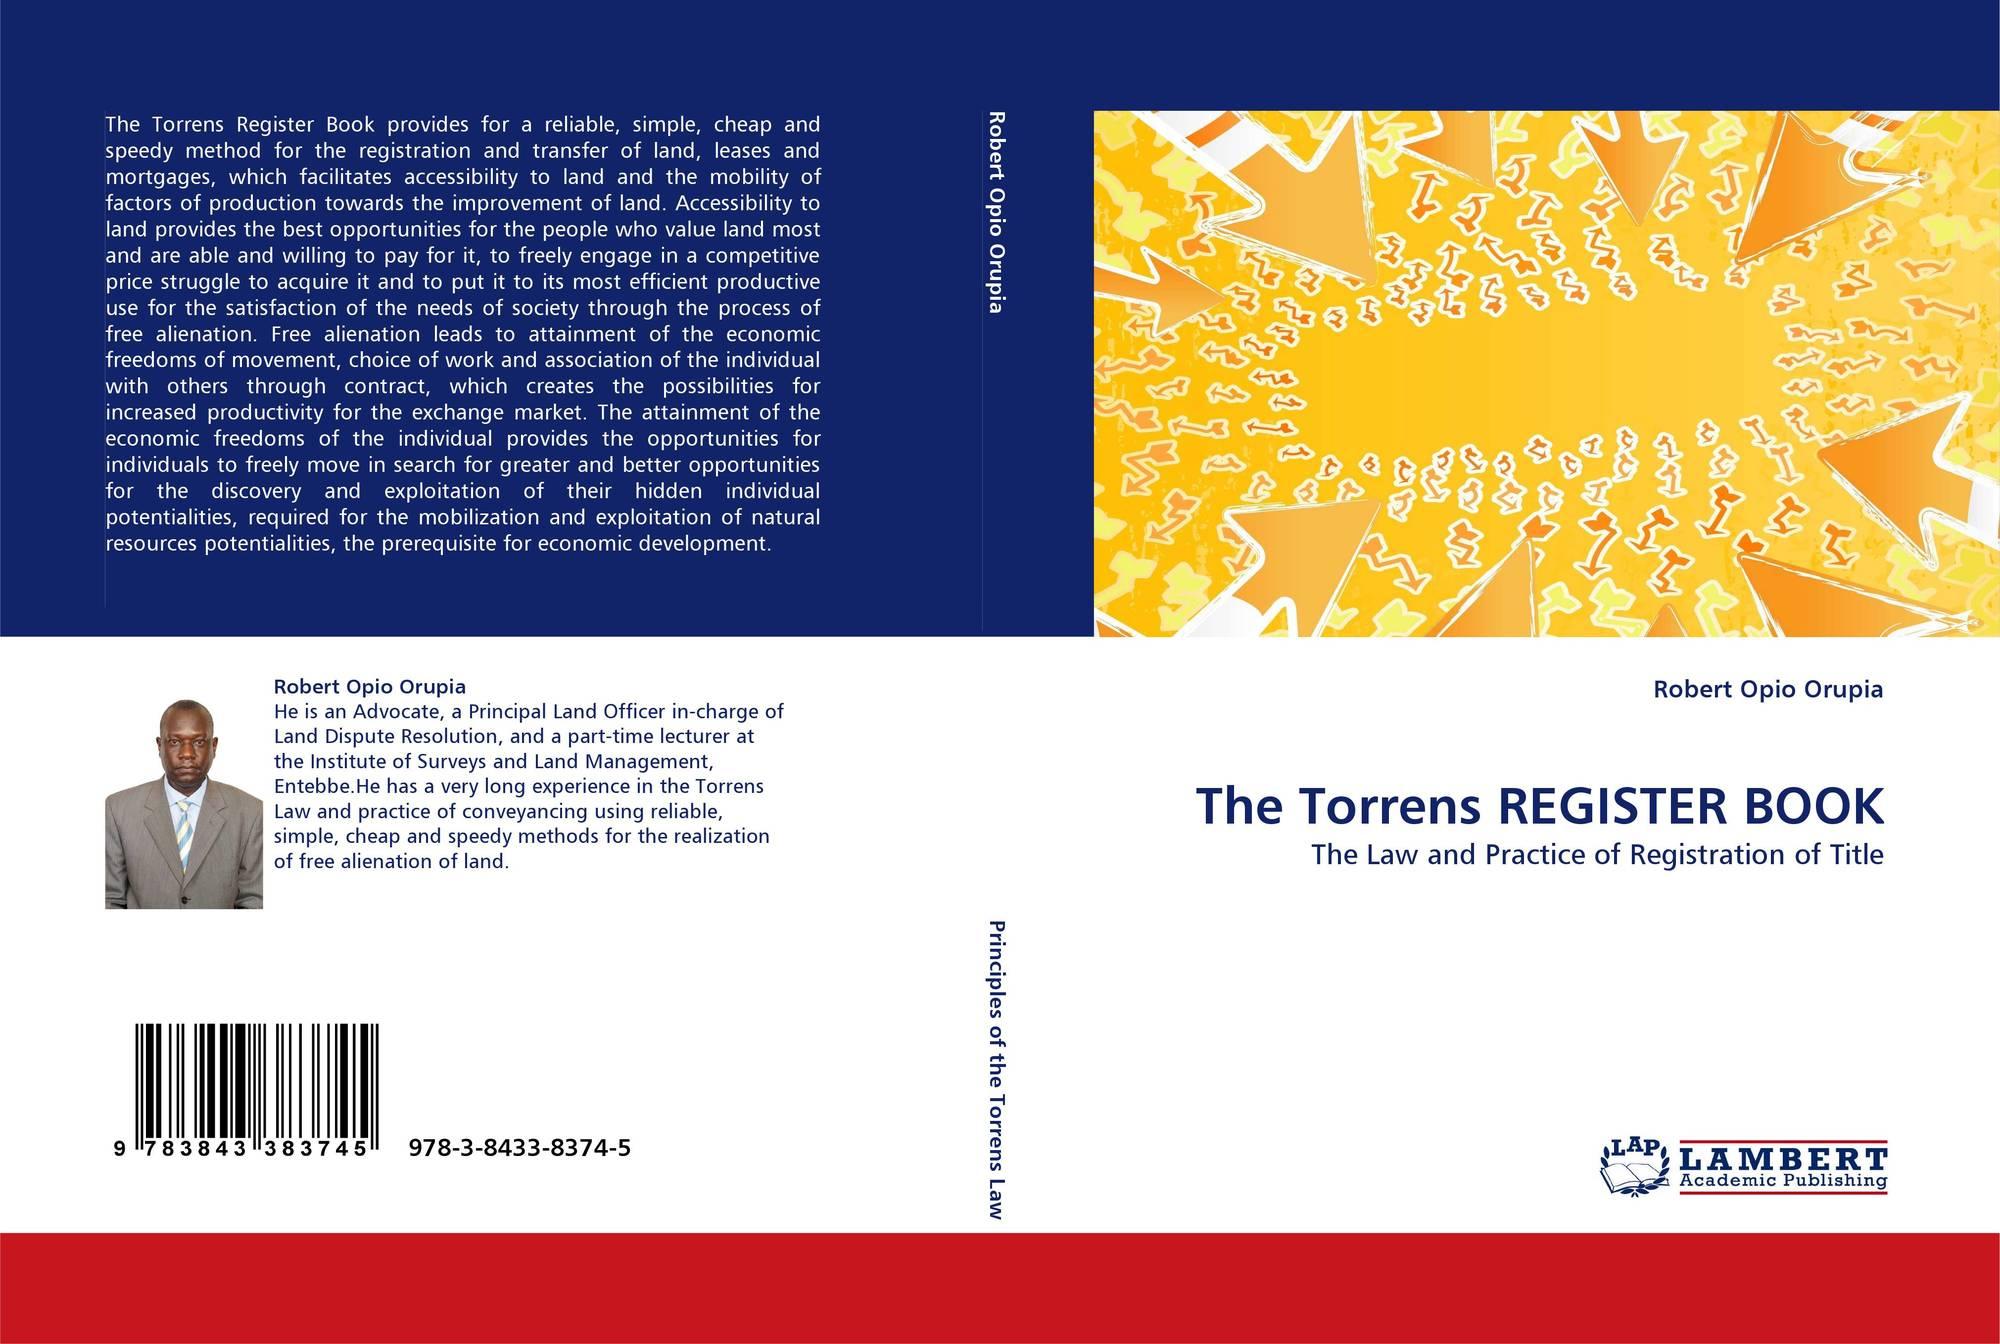 The Torrens REGISTER BOOK, 978-3-8433-8374-5, 384338374X